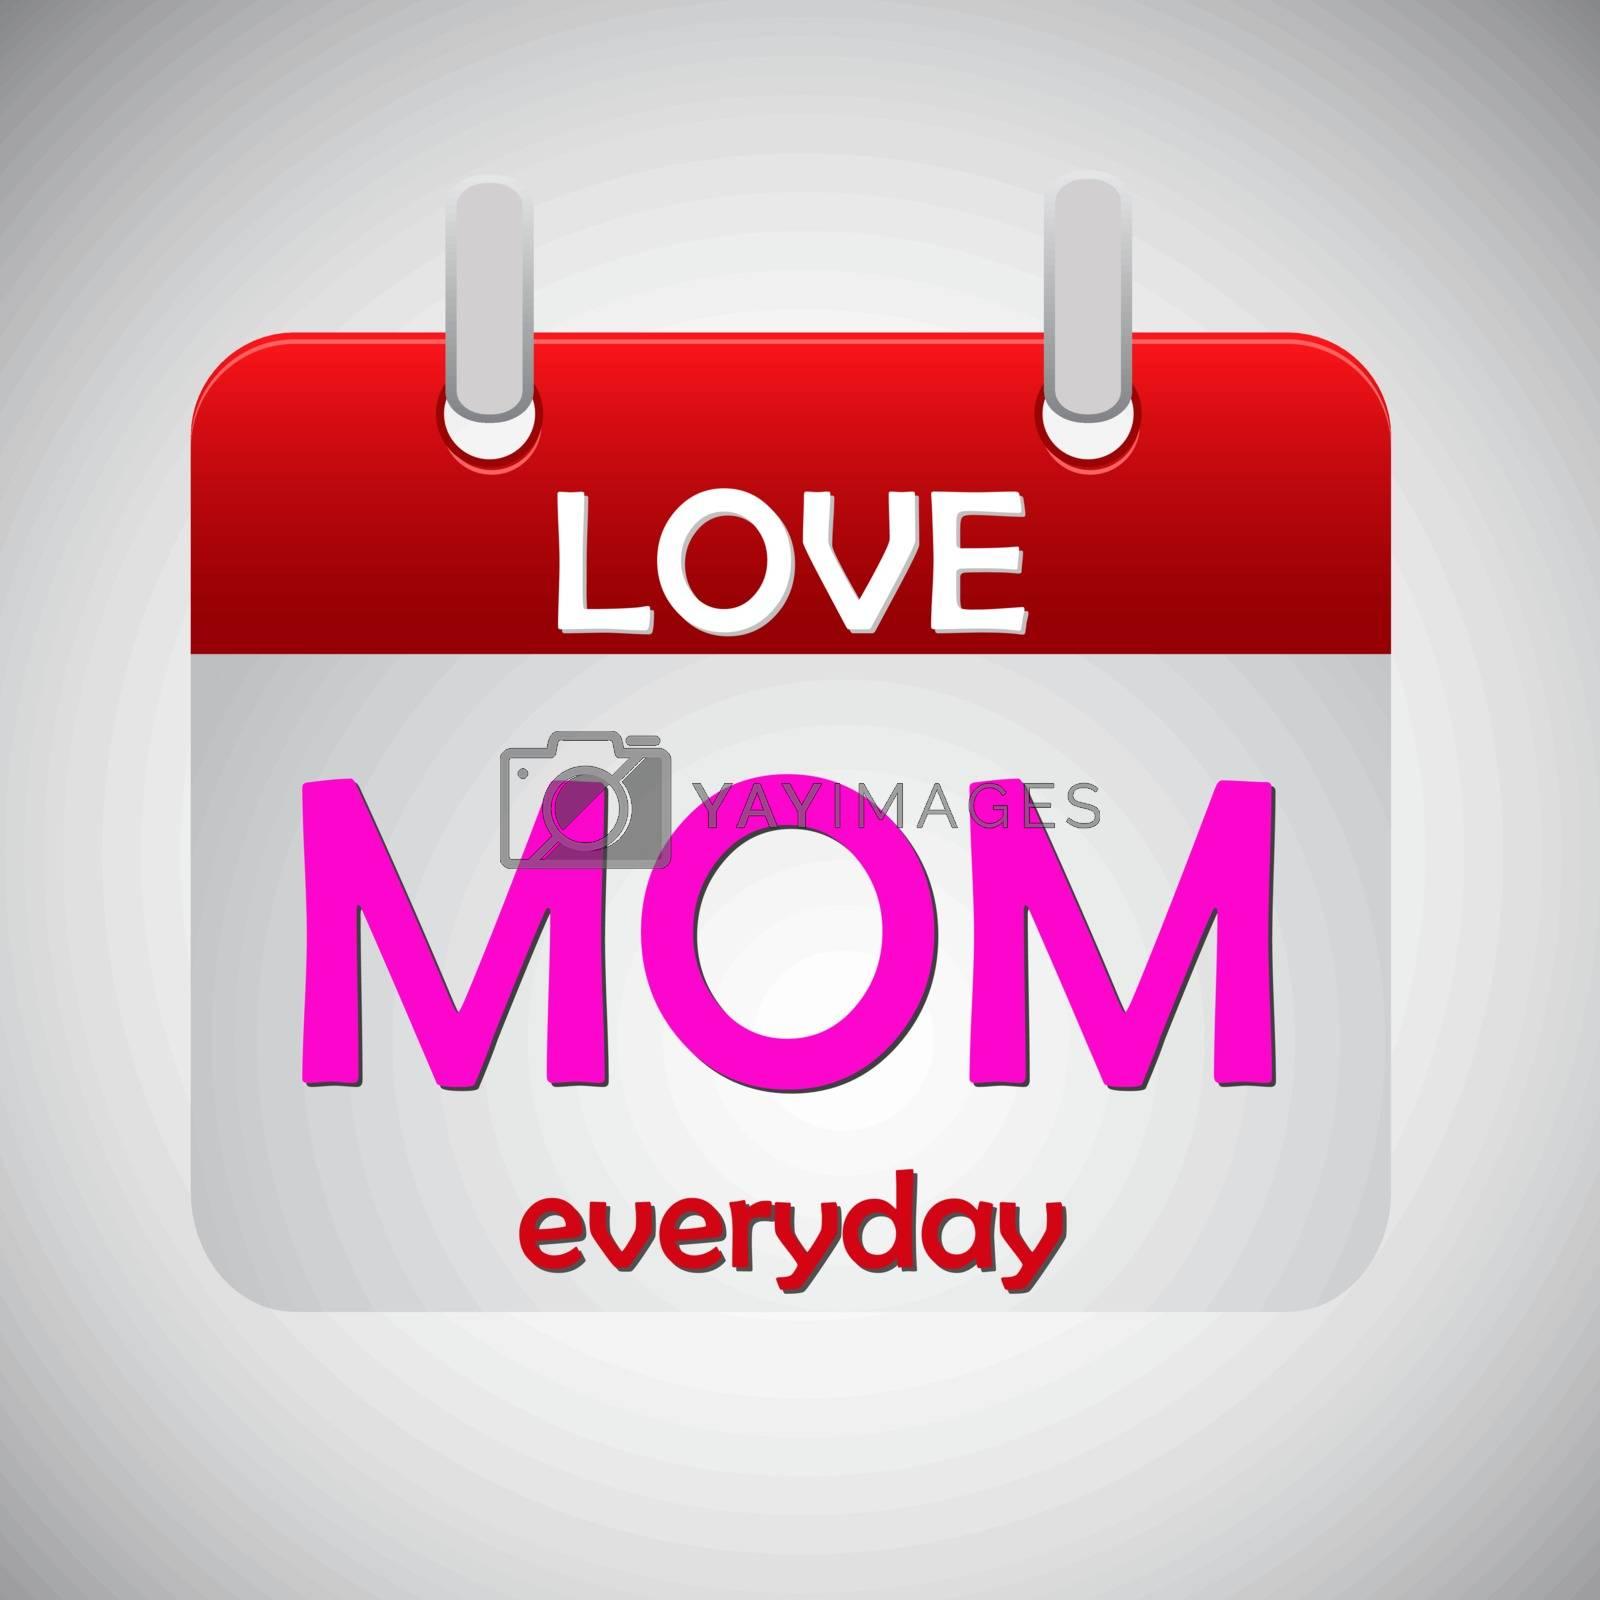 Love mom everyday calendar icon, vector illustration